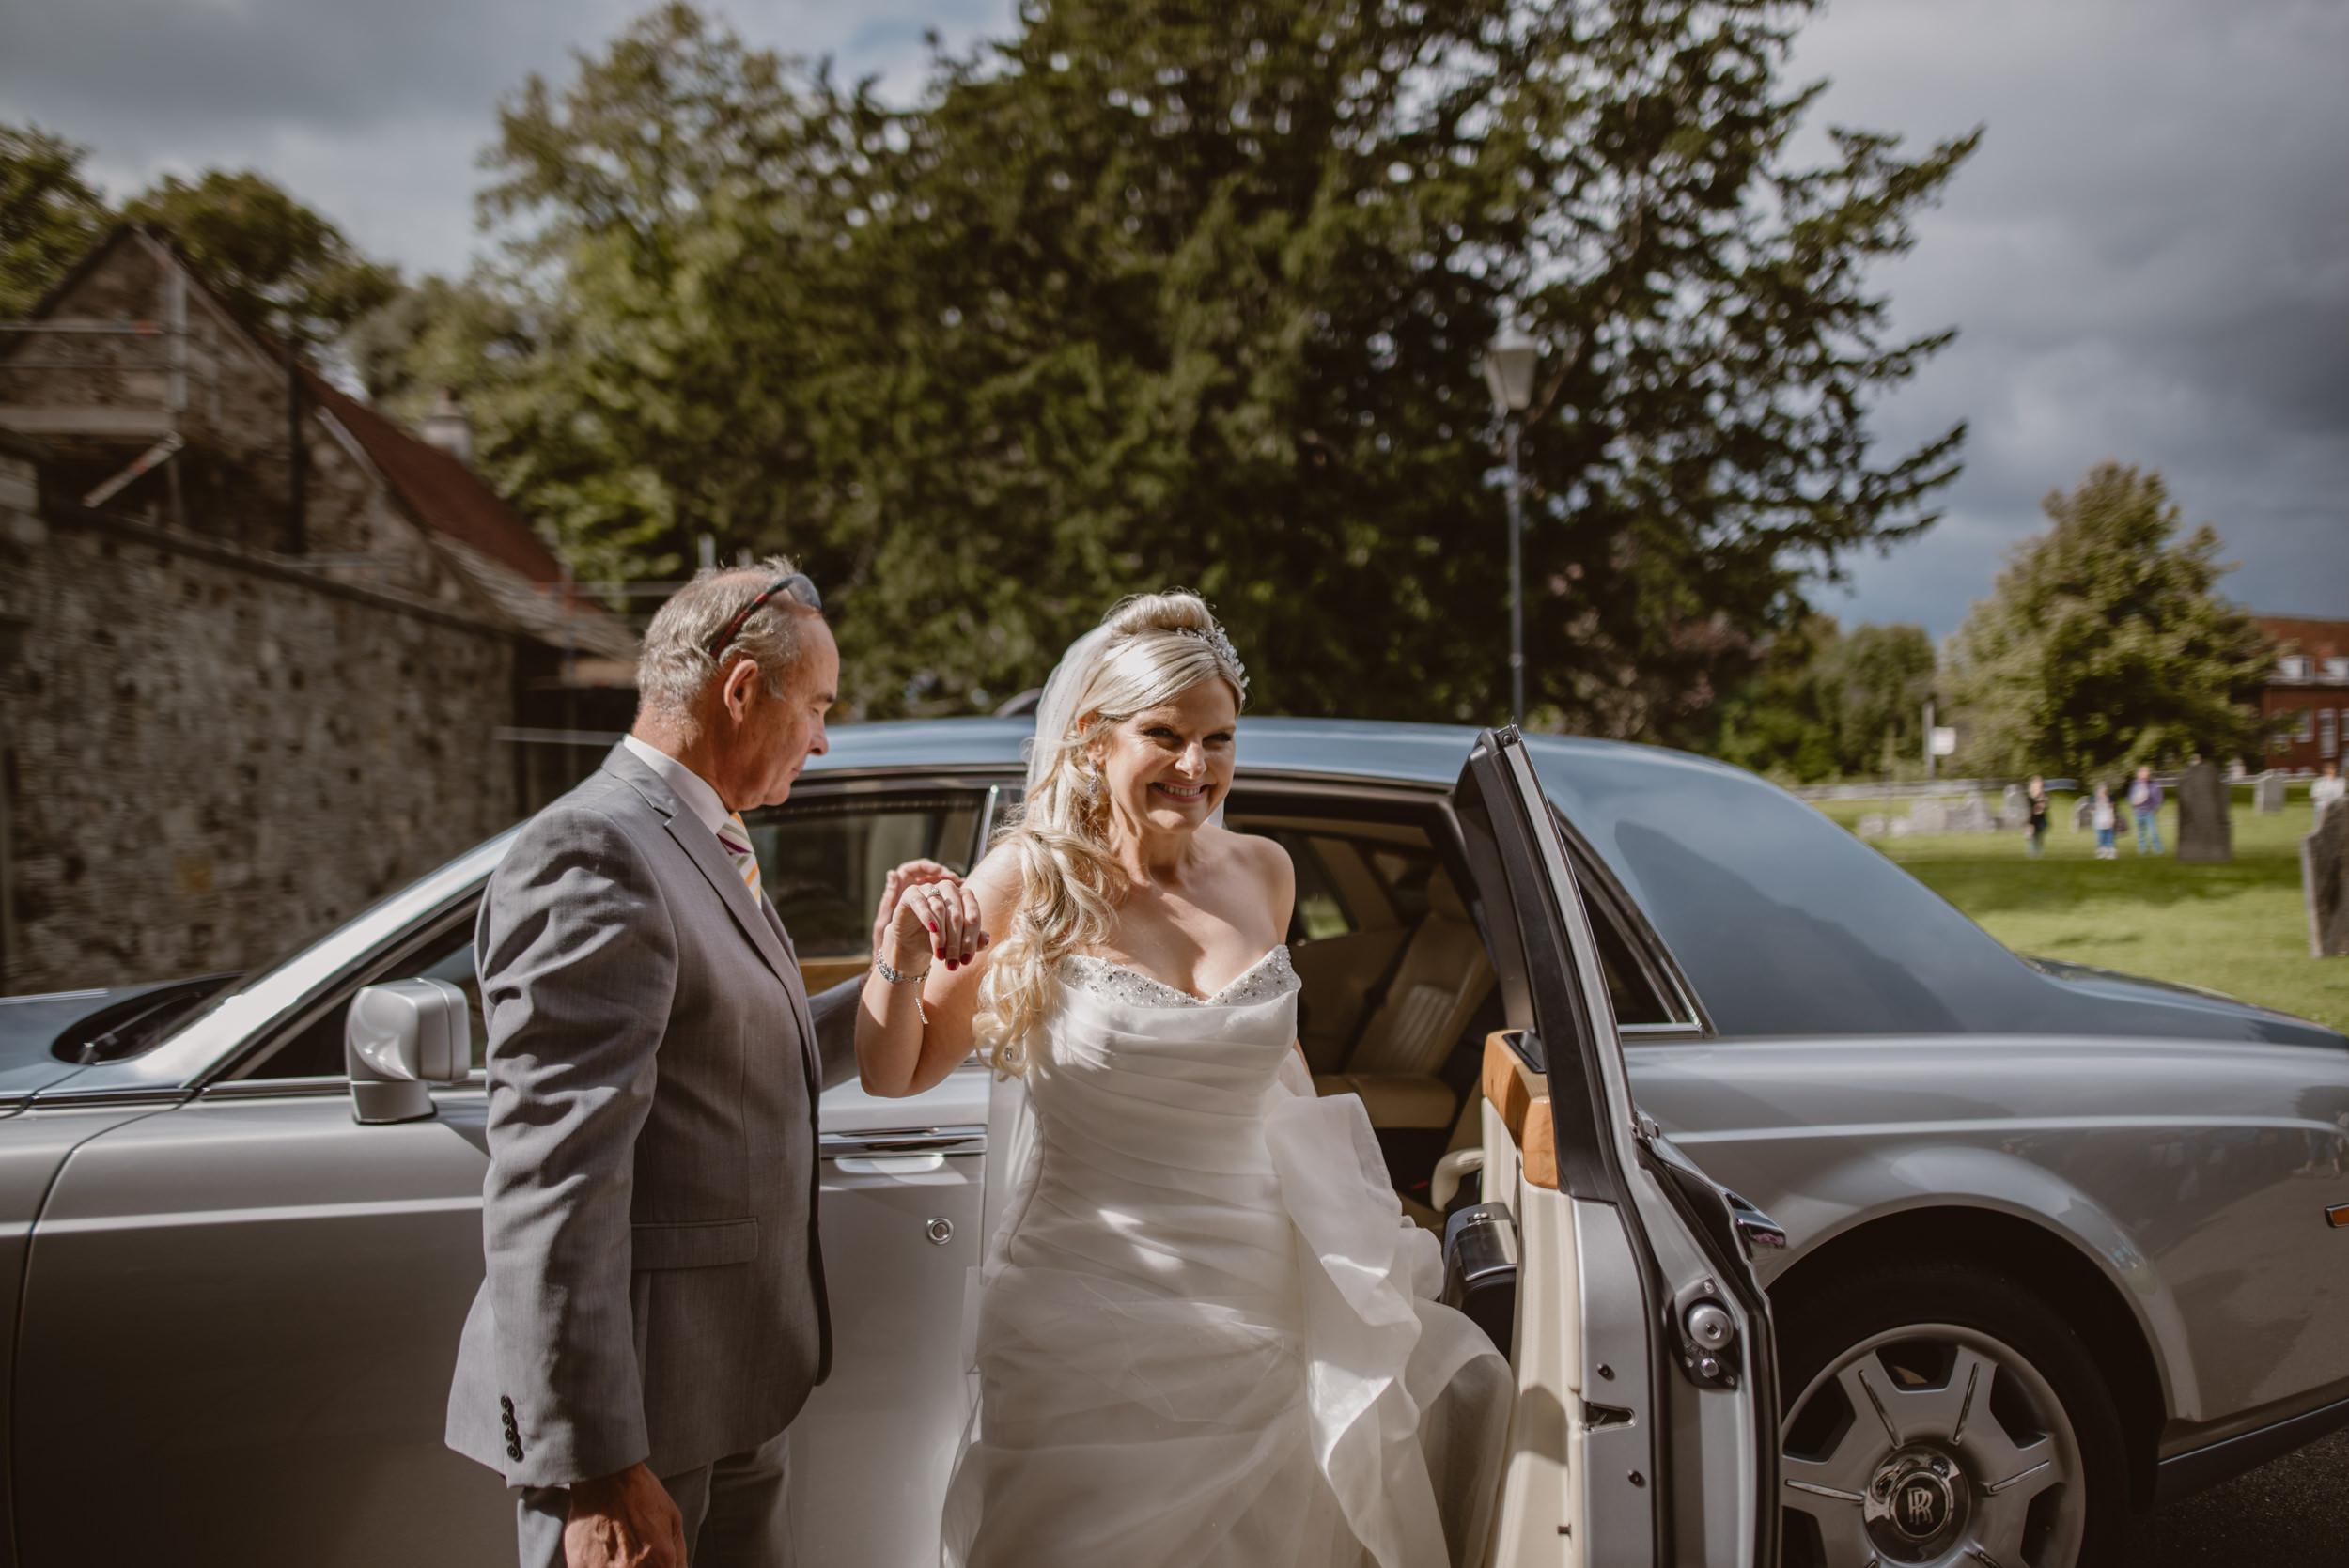 Trisha-and-Roger-wedding-The-Priory-Church-and-Chewton-Glen-Hotel-Christchurch-Manu-Mendoza-Wedding-Photography-102.jpg